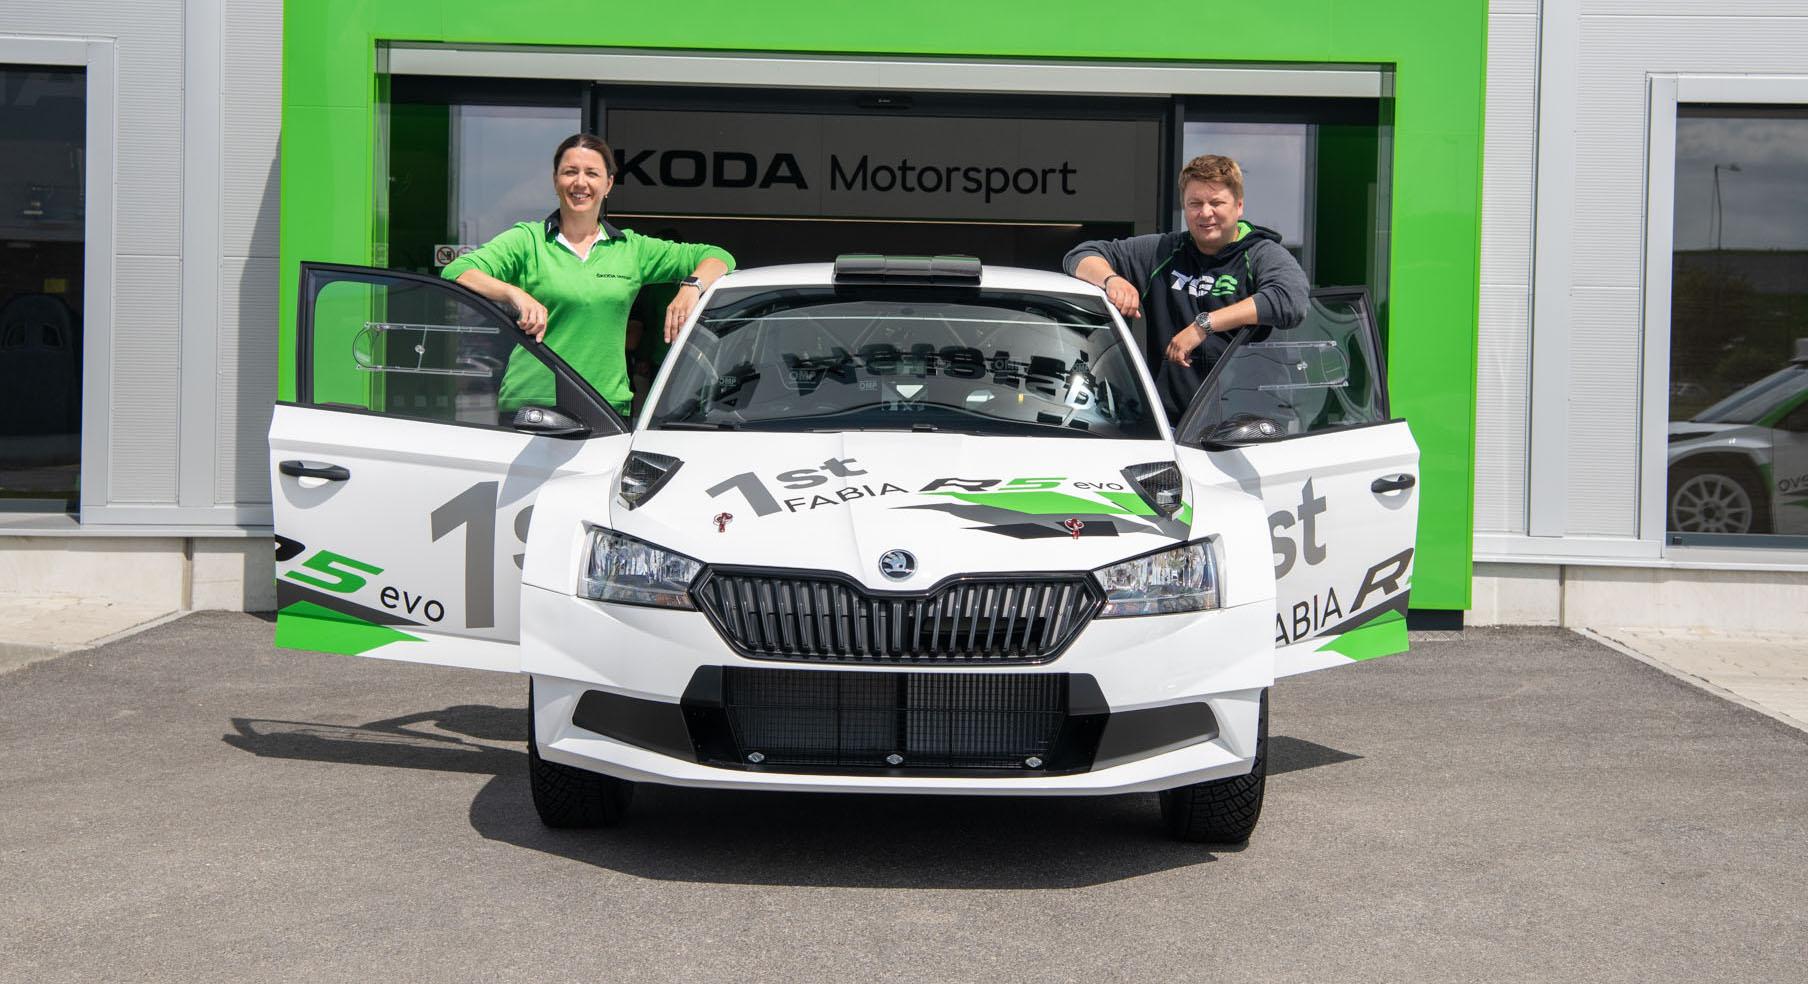 Toni Gardemeister took over the first FABIA R5 evo customer car